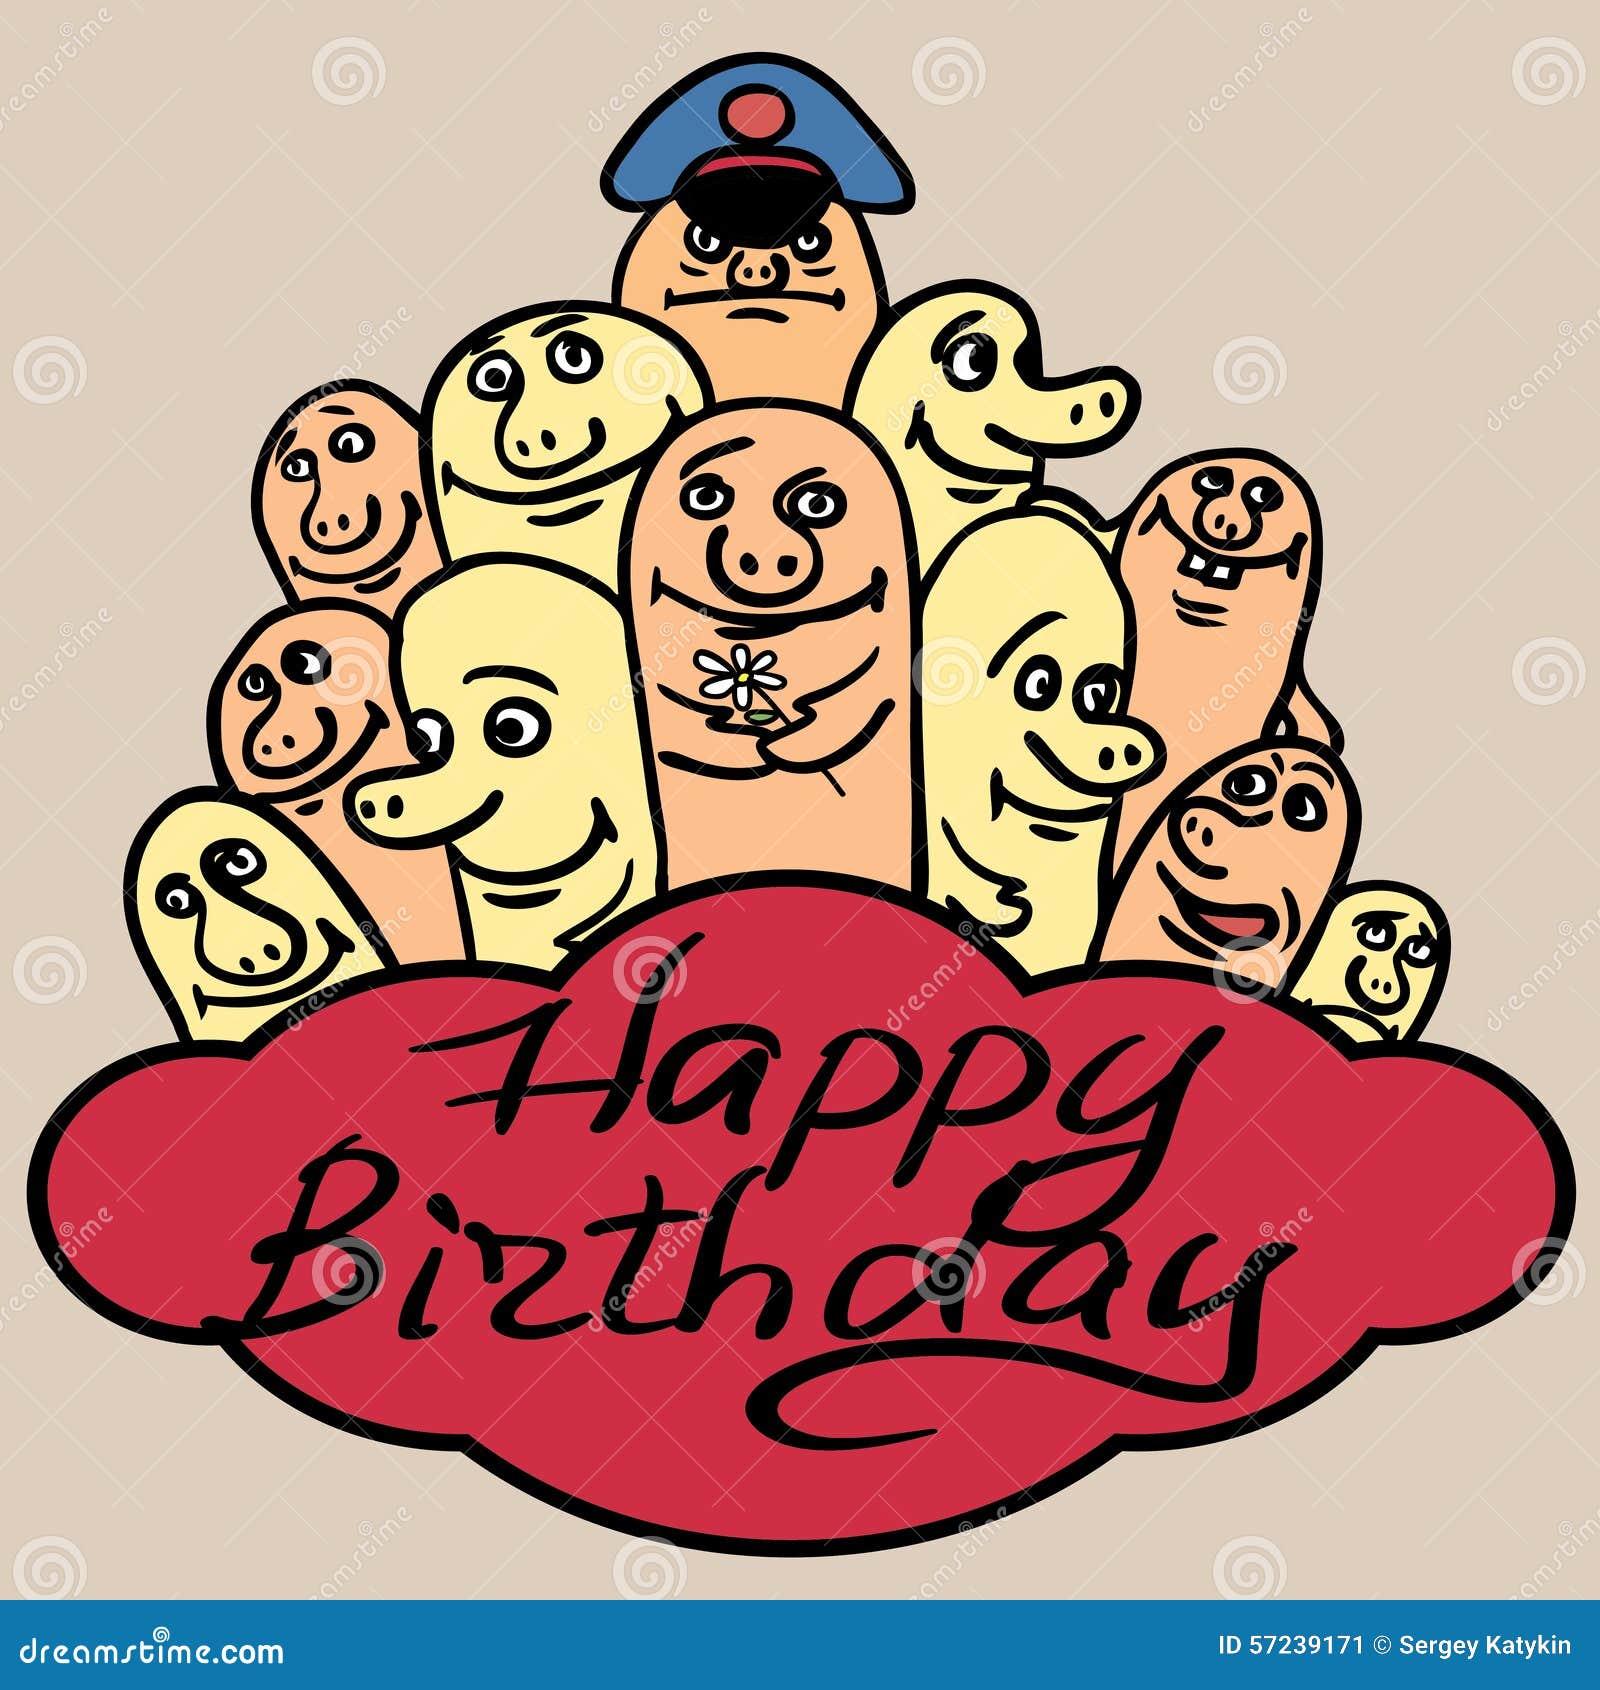 Print Greeting Card Happy Birthday Small Funny Illustration